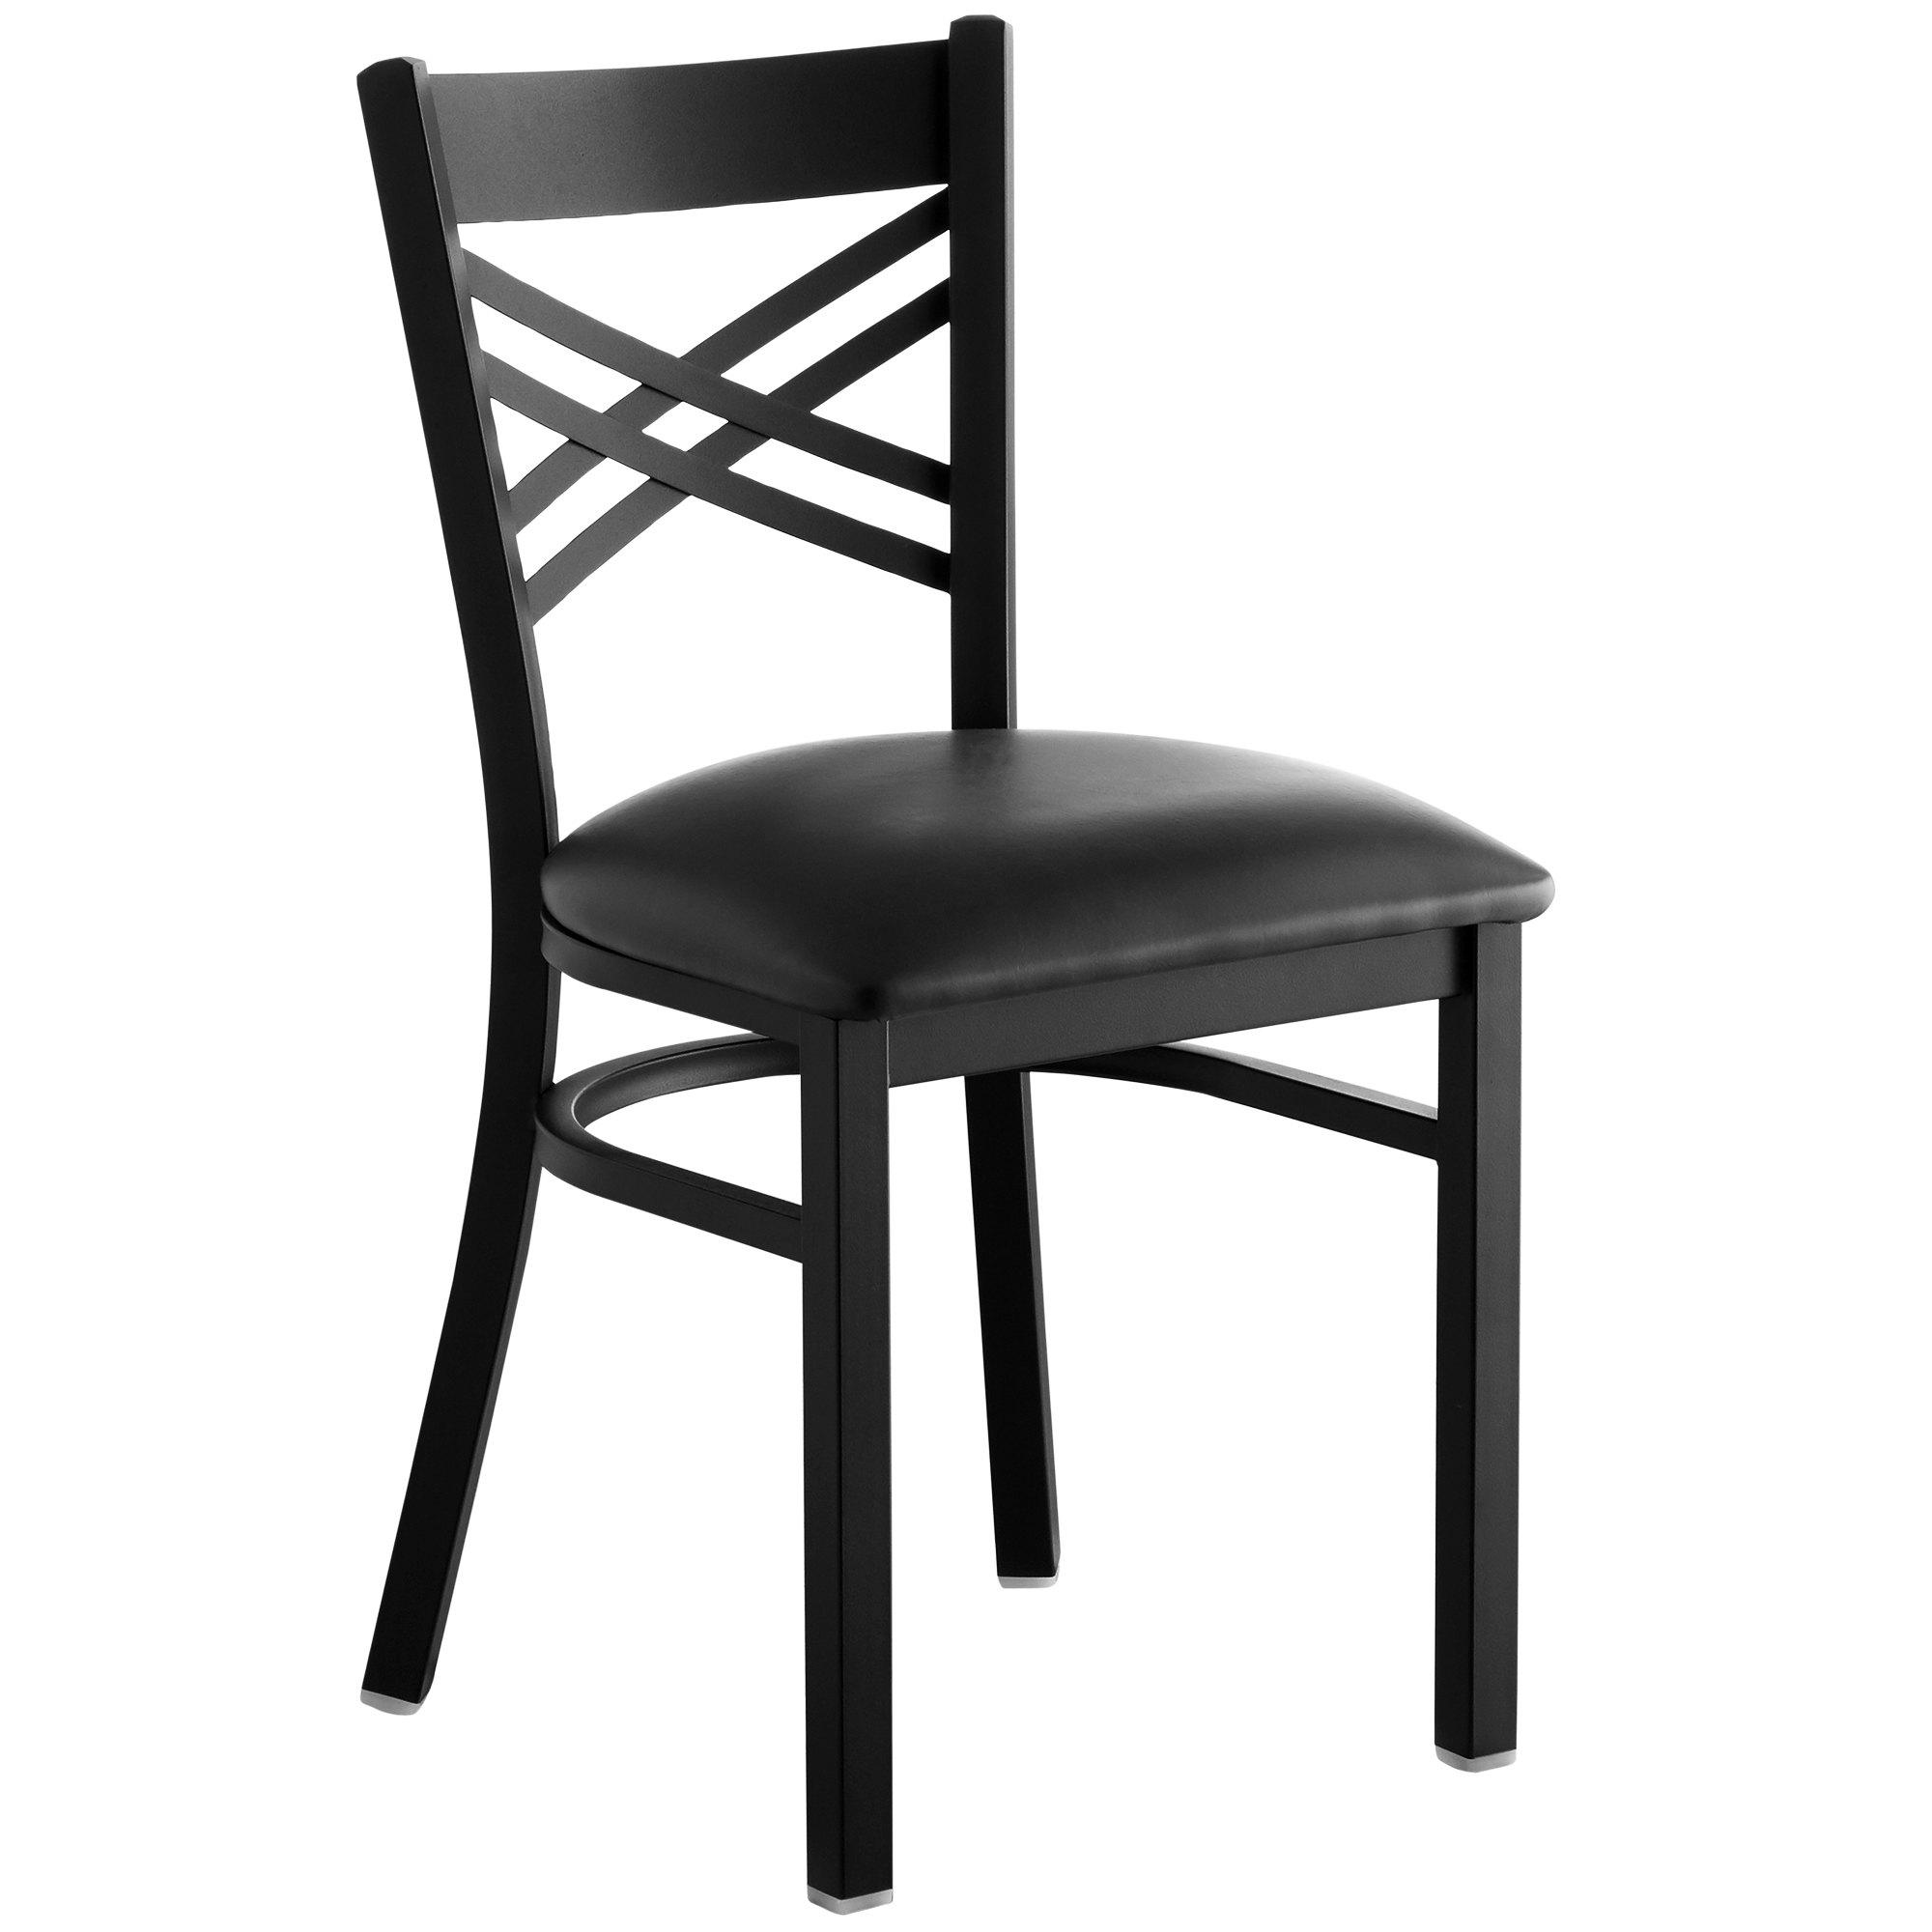 #146 - Black Cross Back Design Restaurant Metal Chair with Black Vinyl Seat